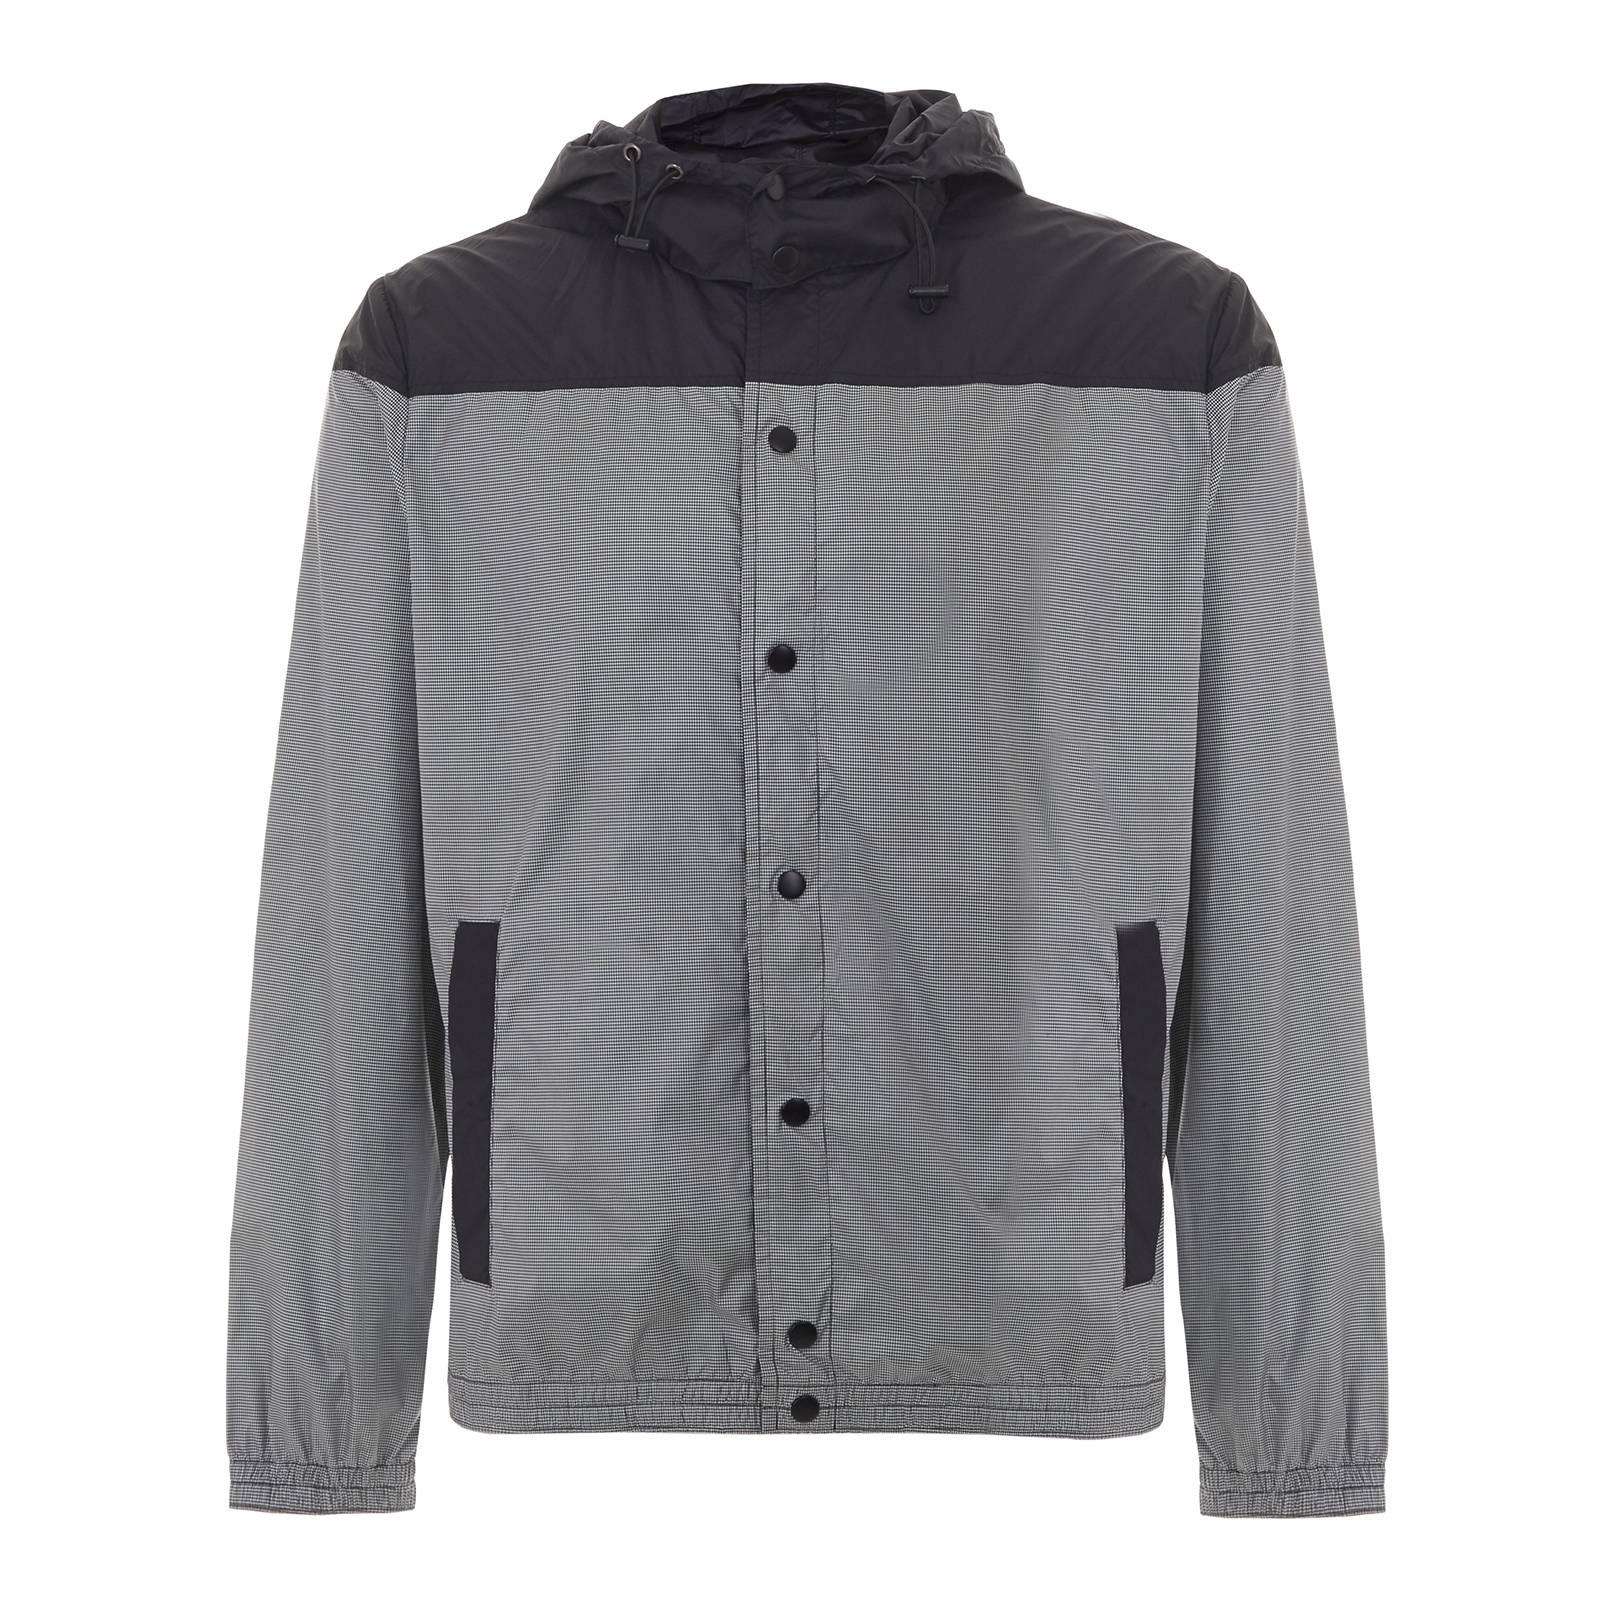 Куртка HewittAW16 PROMO SALE<br><br><br>Артикул: 1116104<br>Материал: 100% полиэстер<br>Цвет: сине-белая микроклетка<br>Пол: Мужской